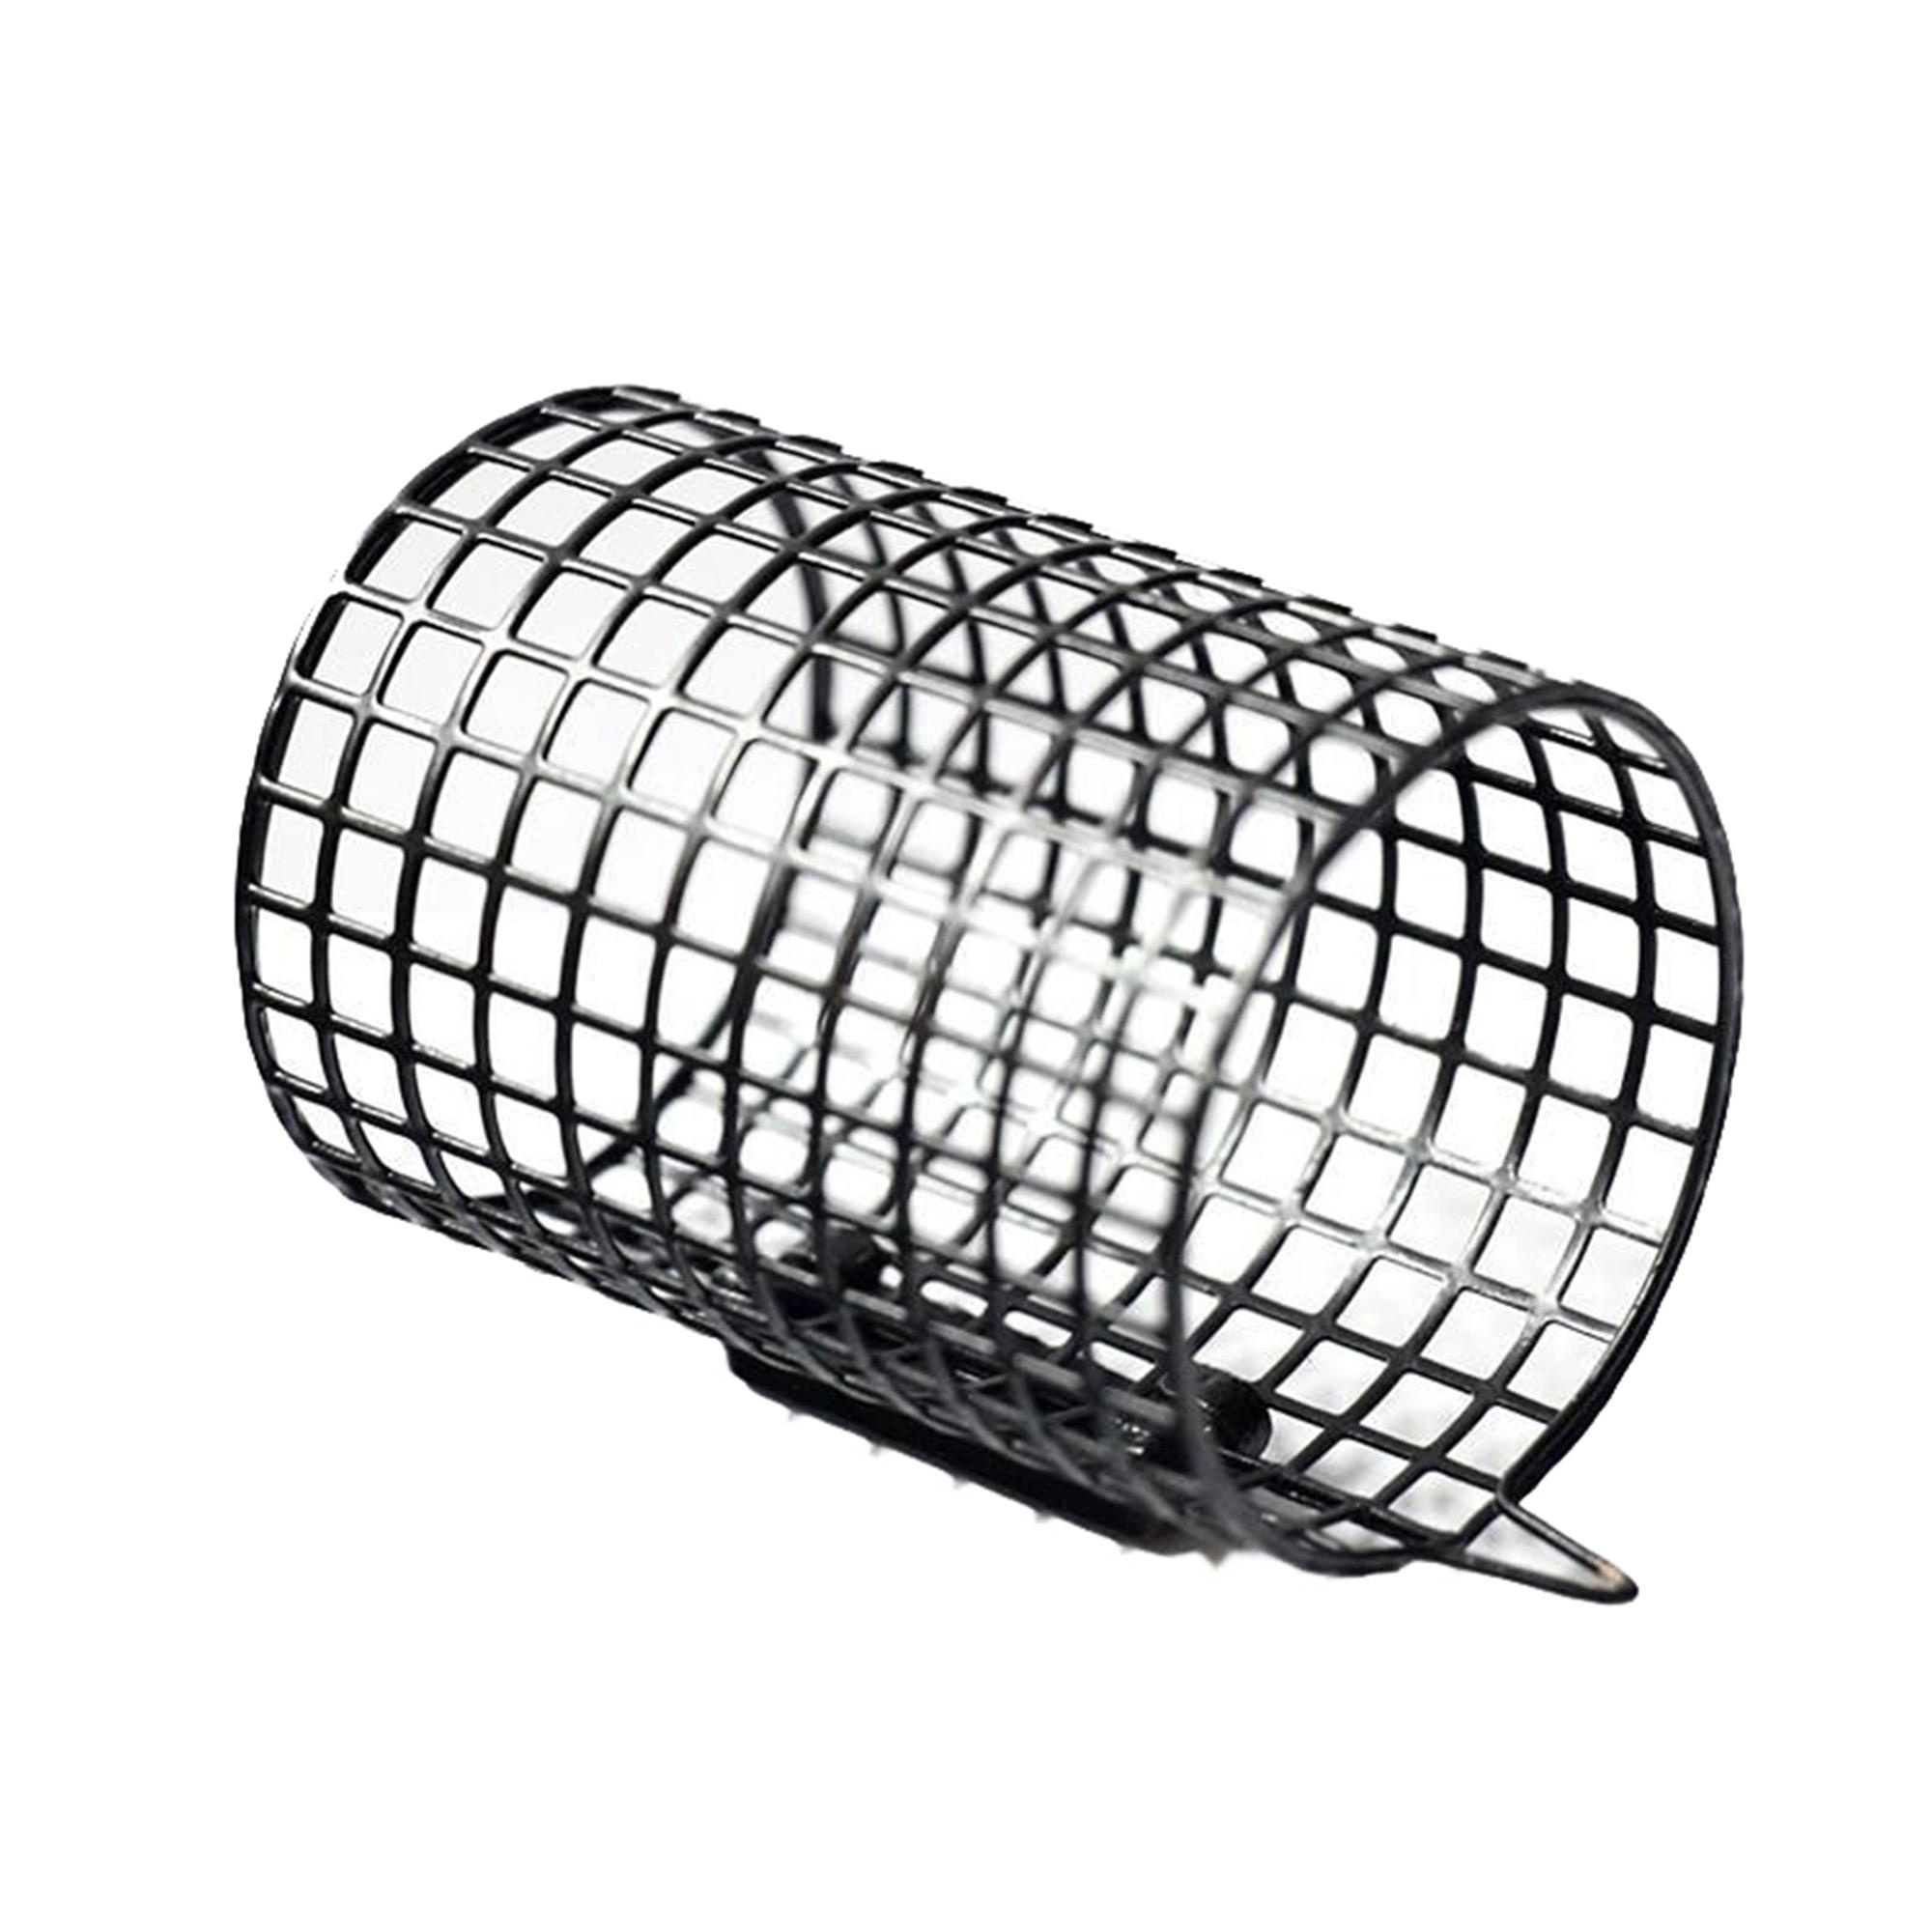 Pasturatore Cage feeder Big WILD FISHING